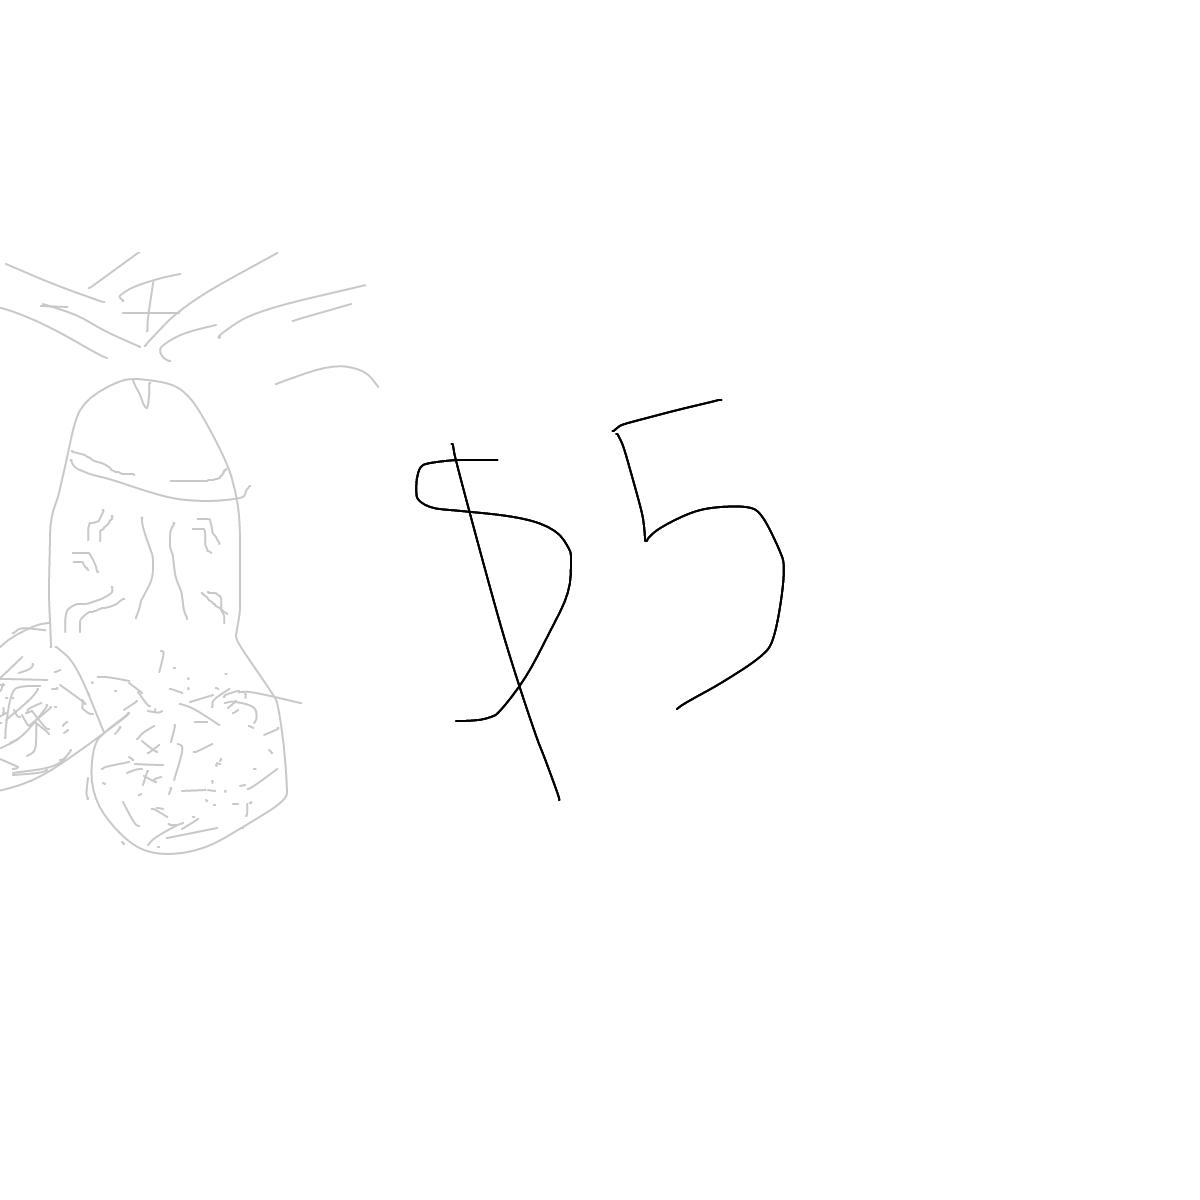 BAAAM drawing#9088 lat:32.9787216186523440lng: -96.2443542480468800